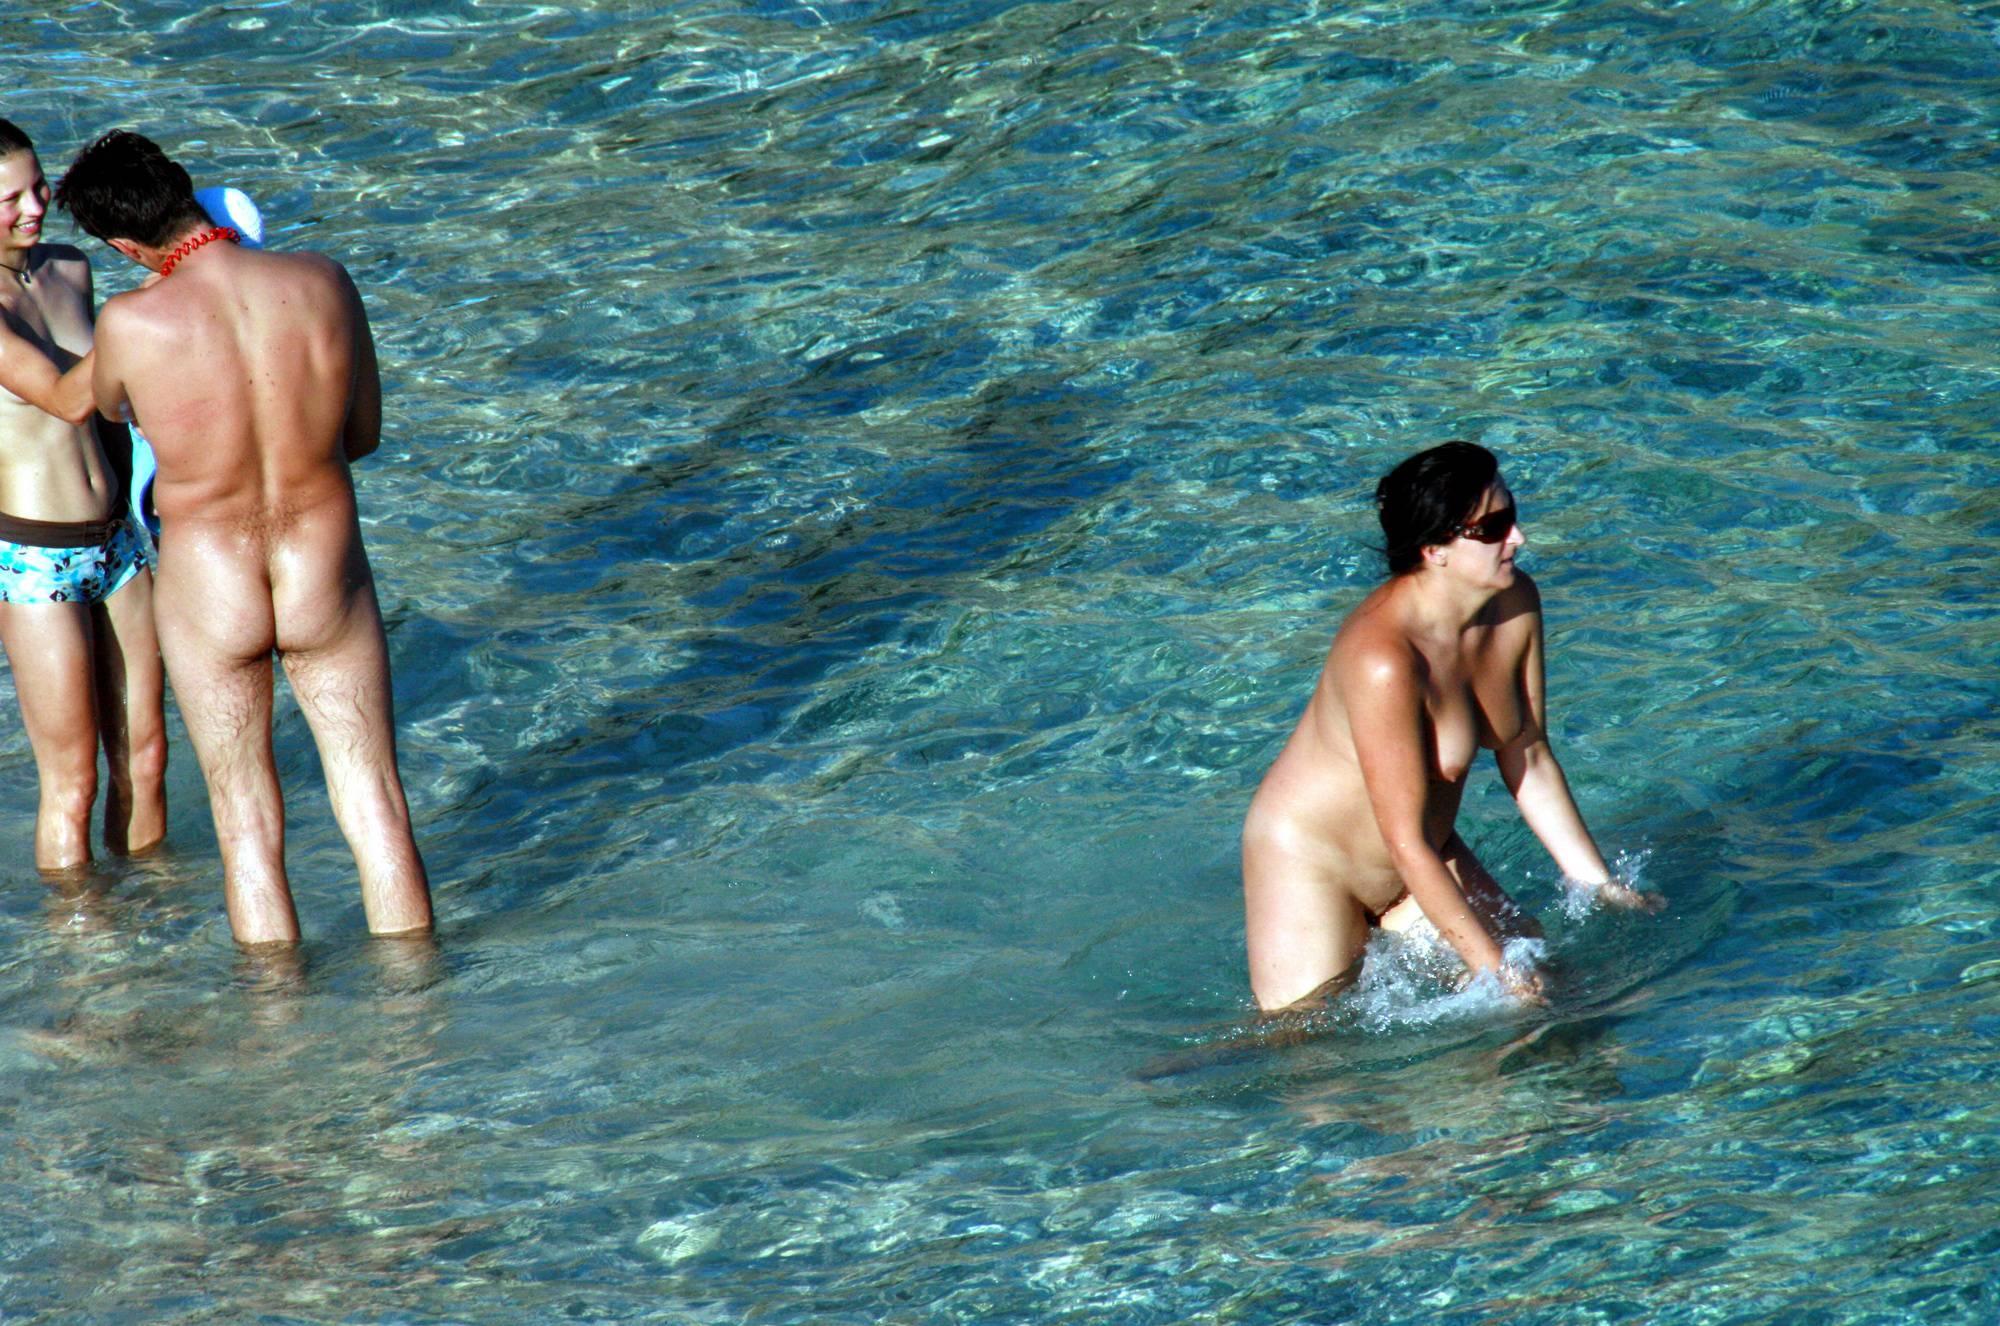 Nudist Pics Family Evening Near Water - 1